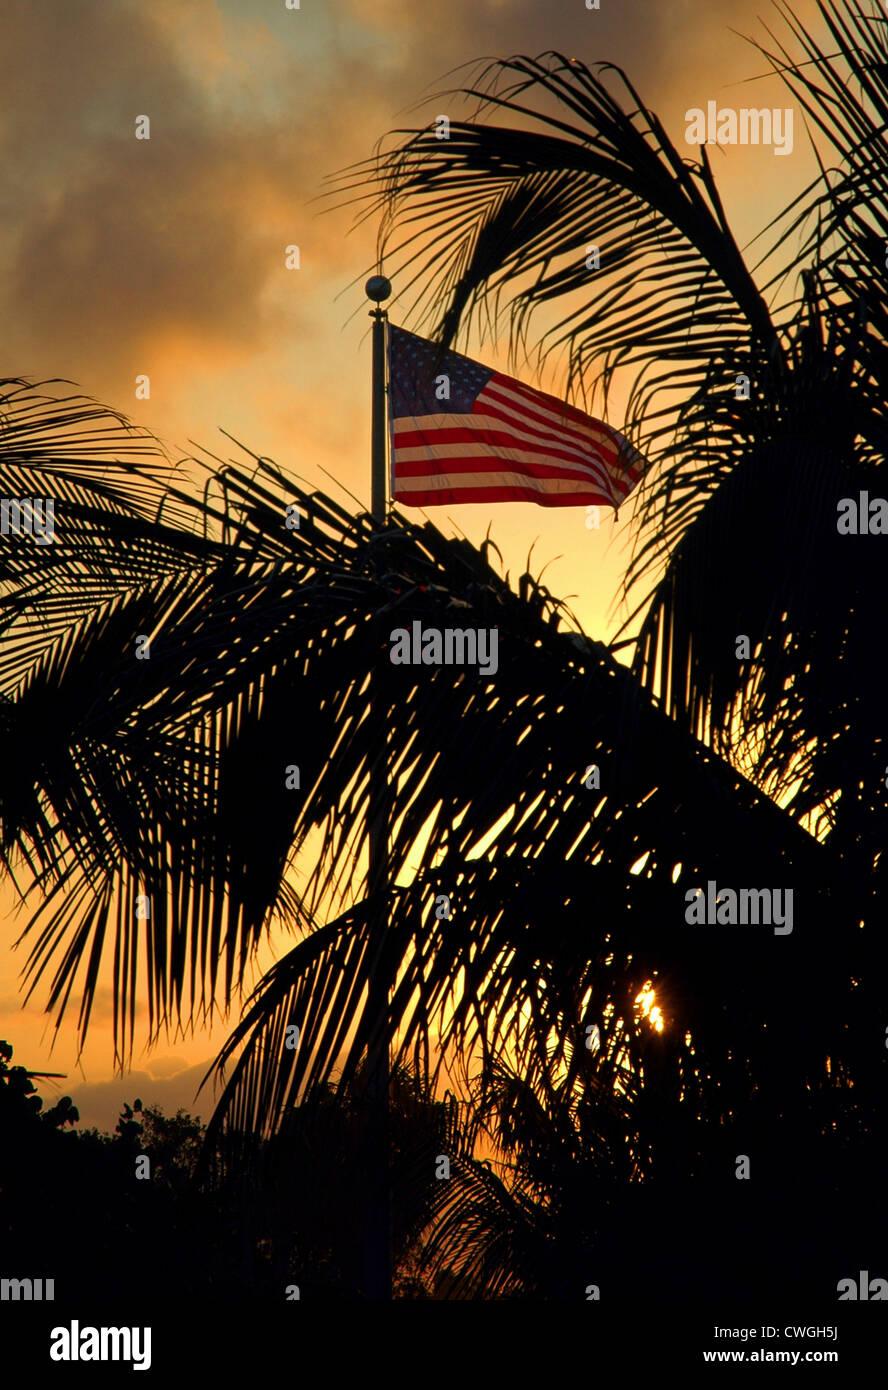 USA Flag At Sunset Stock Photo